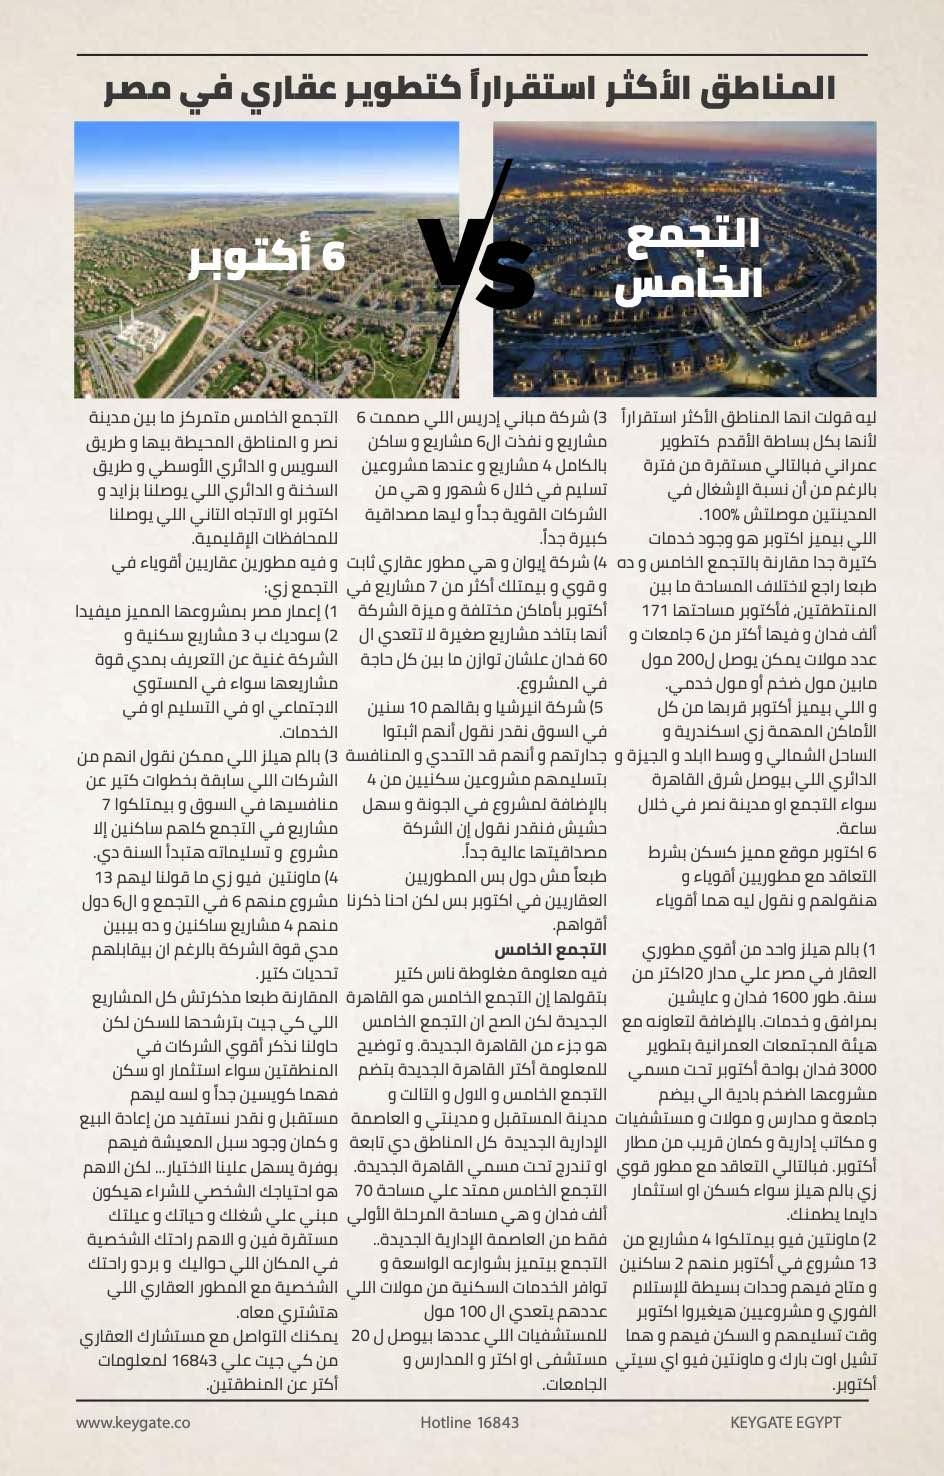 KeyGate Real Estate' Newspaper 24:1:2020 3.0